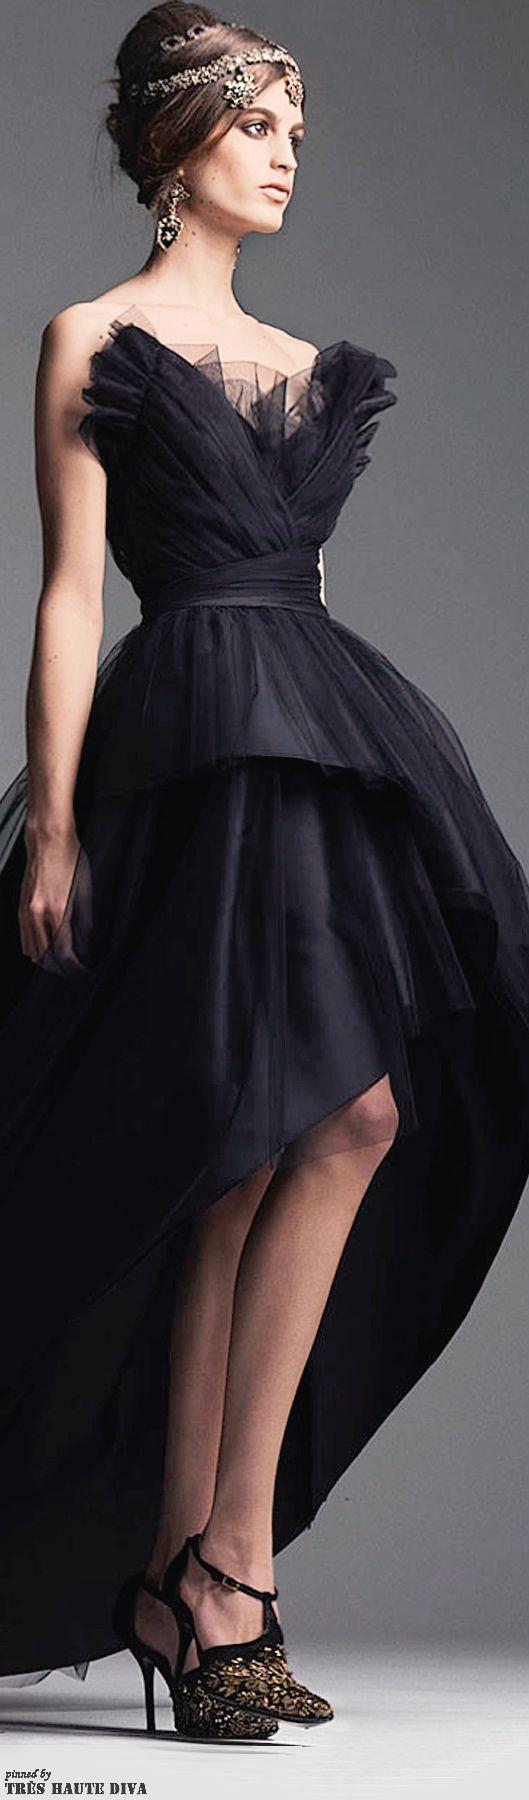 Alberta Ferretti Pre-Fall 2014 I love the bodice on this dress. It looks like wings...